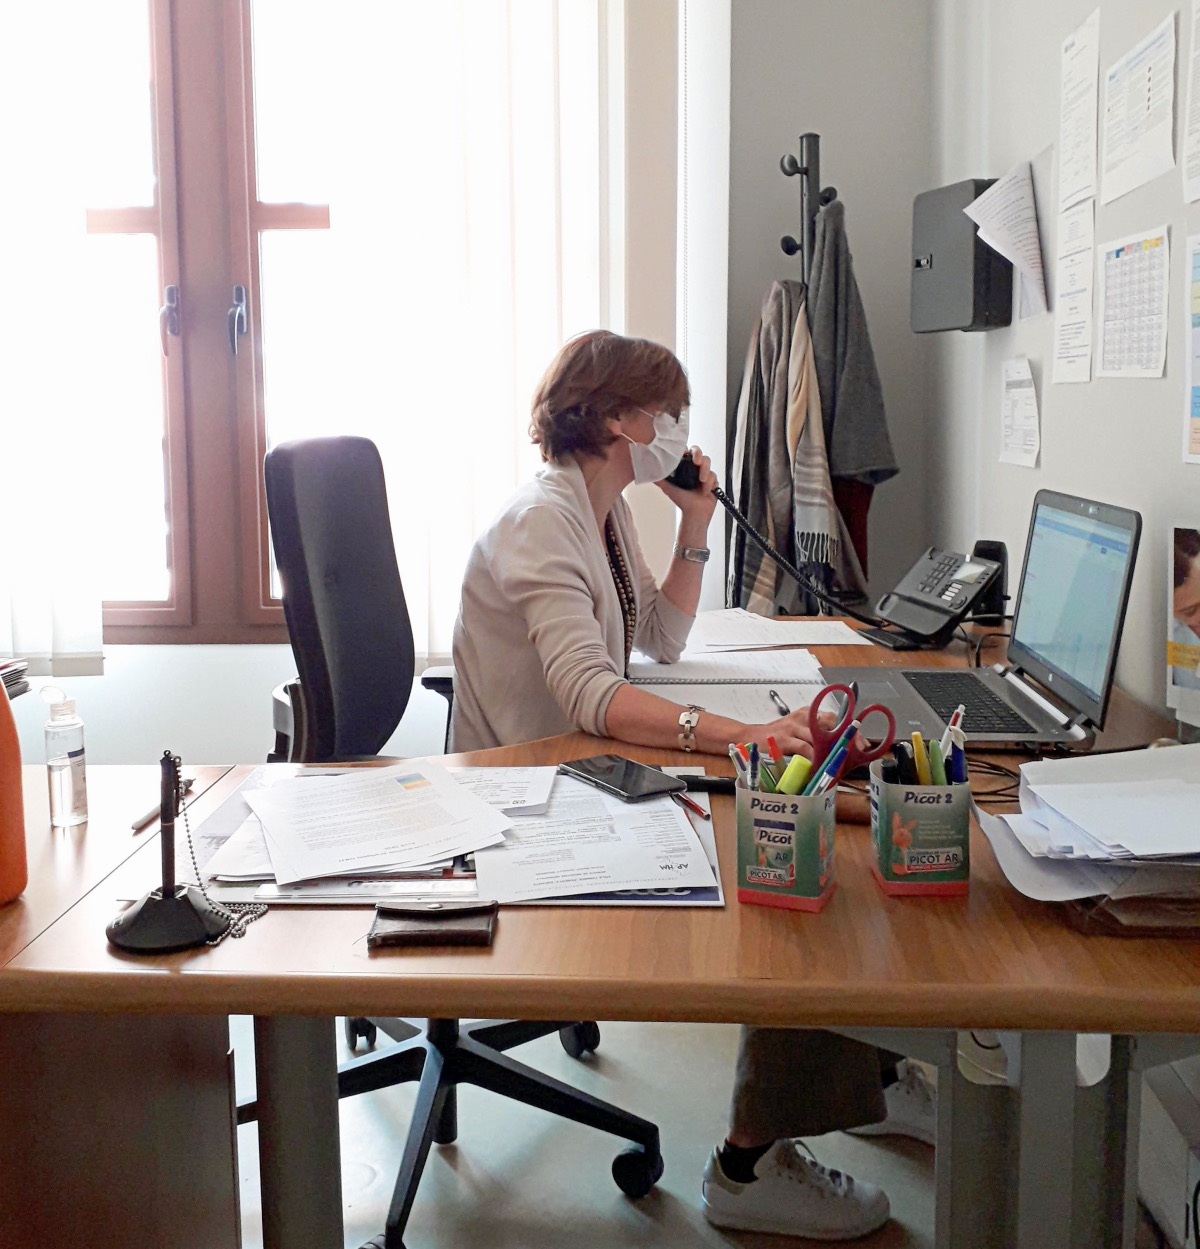 , Témoignage : Florence Theron, médecin PMI, assure la vaccination obligatoire des tout-petits, Made in Marseille, Made in Marseille